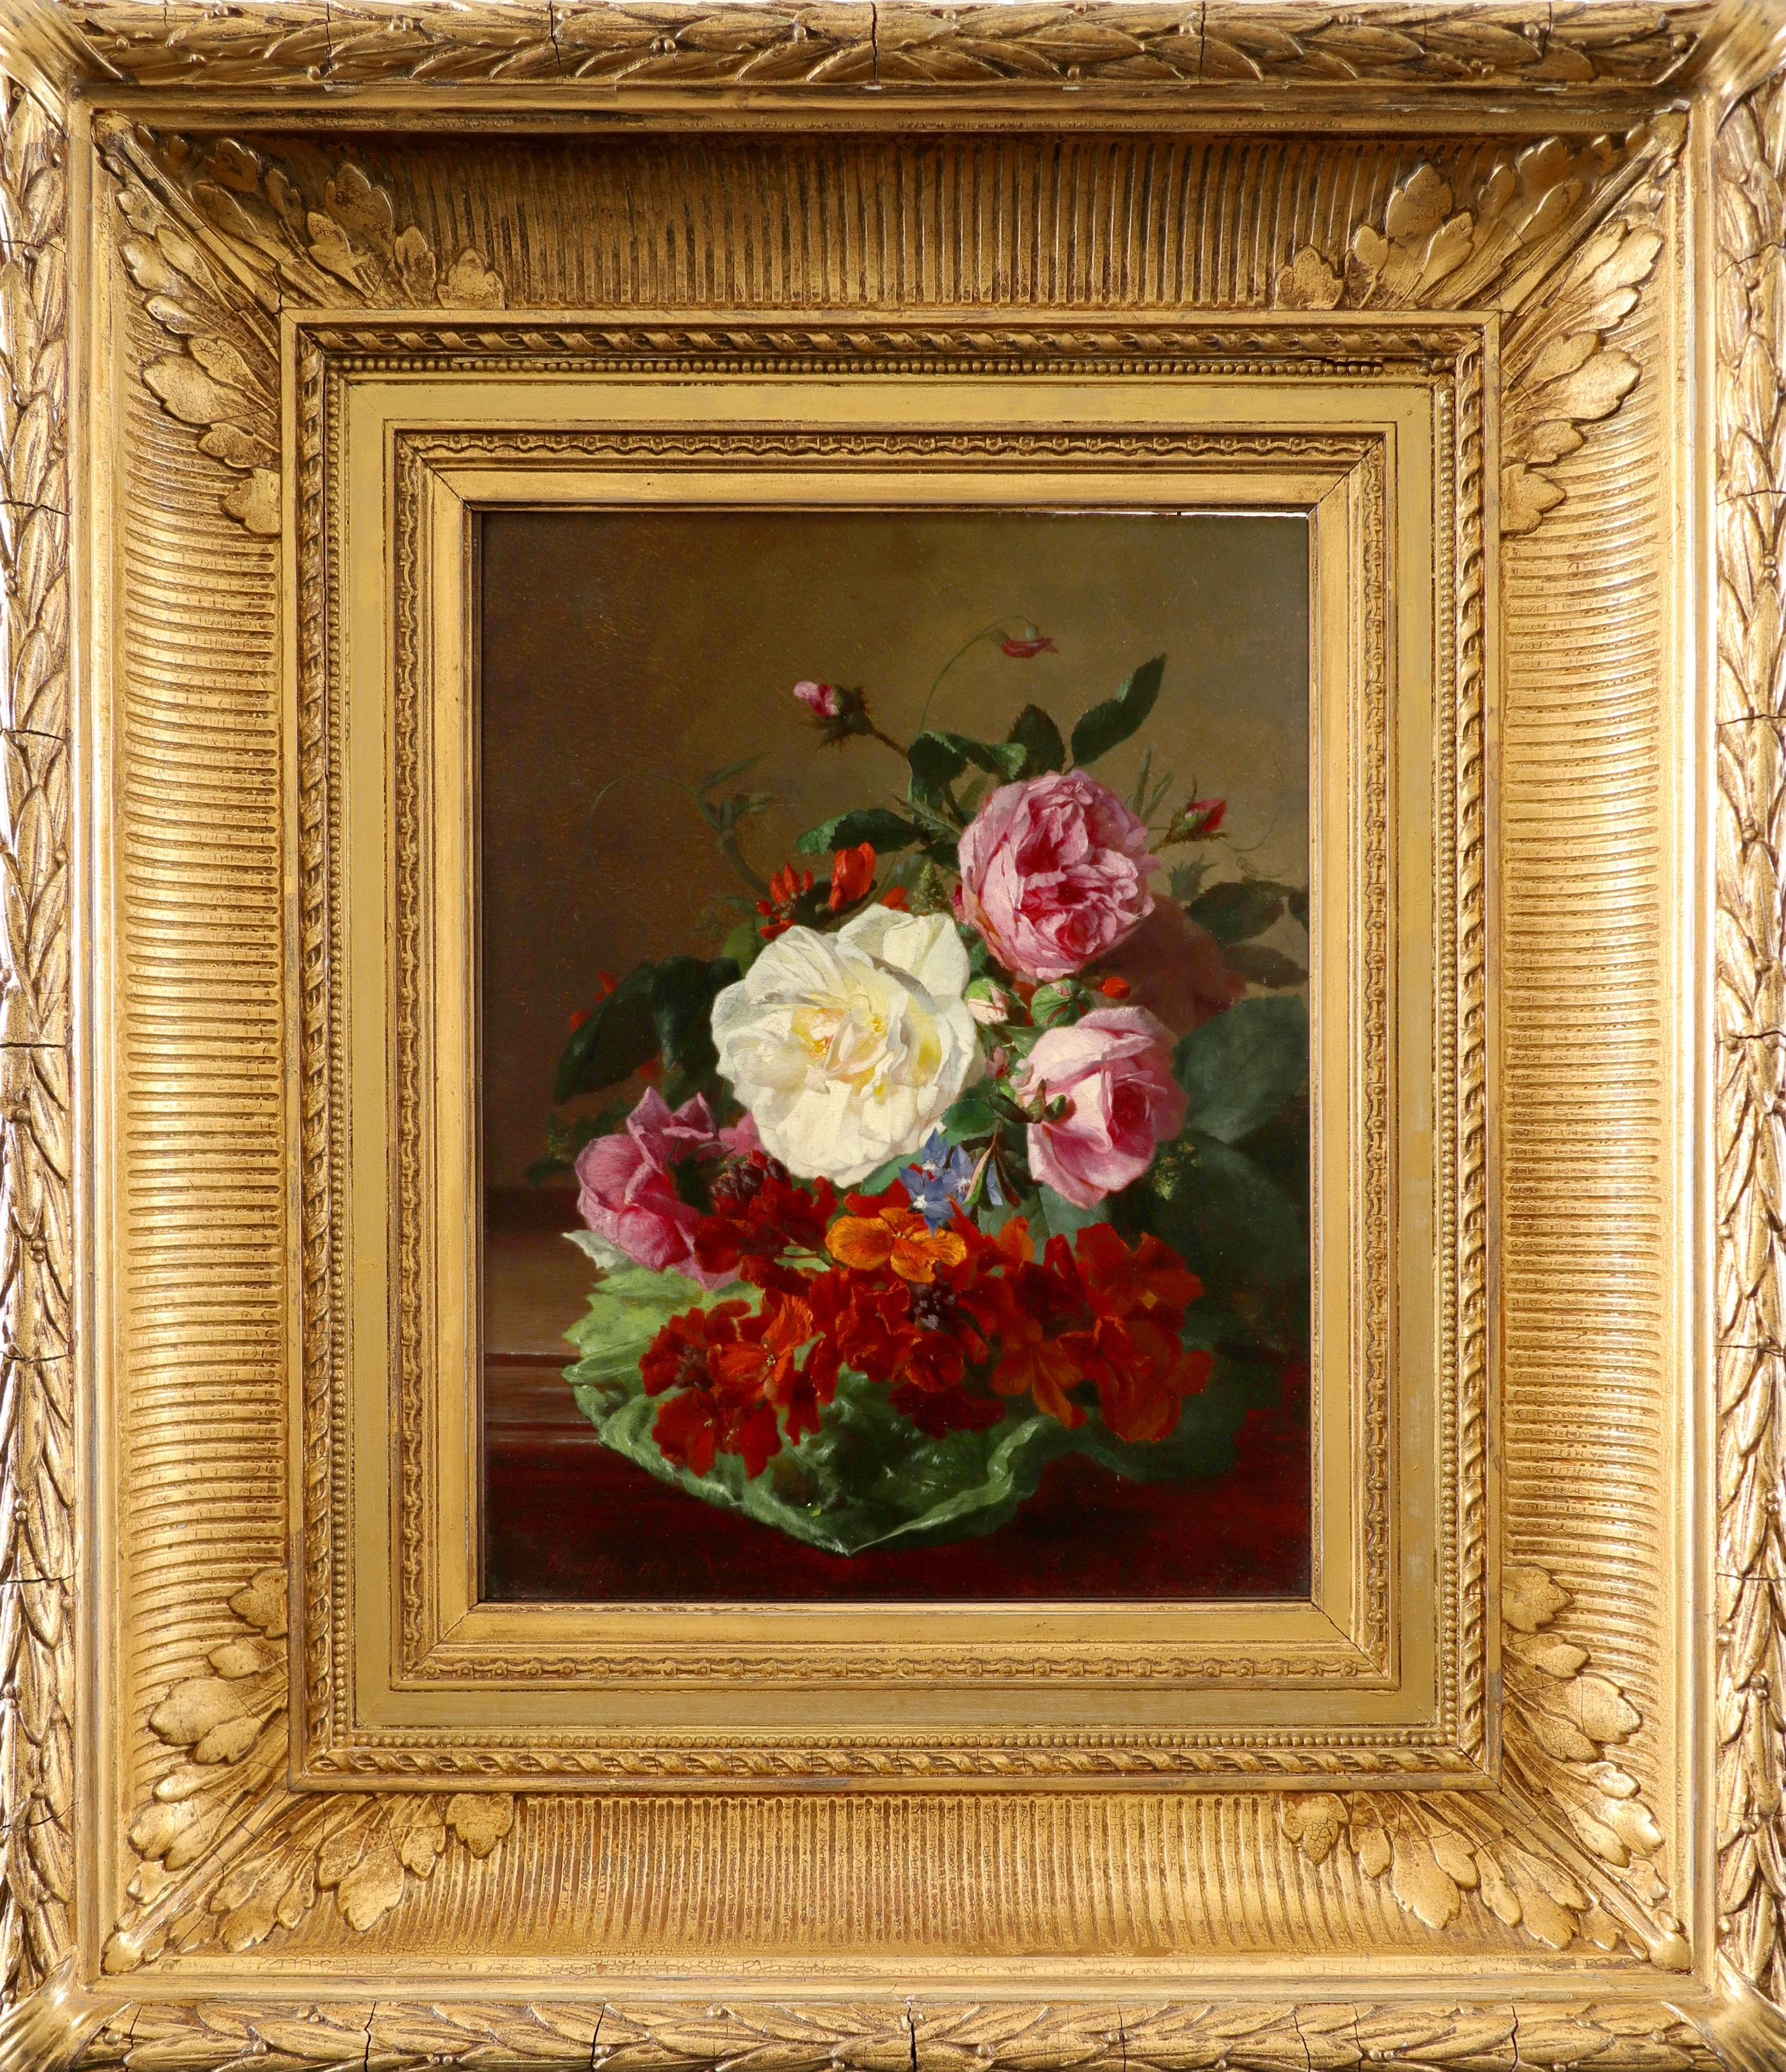 David Emil Joseph De Noter (Belgian 1825-1875) Still life with flowers on a ledge Signed David de - Image 2 of 3